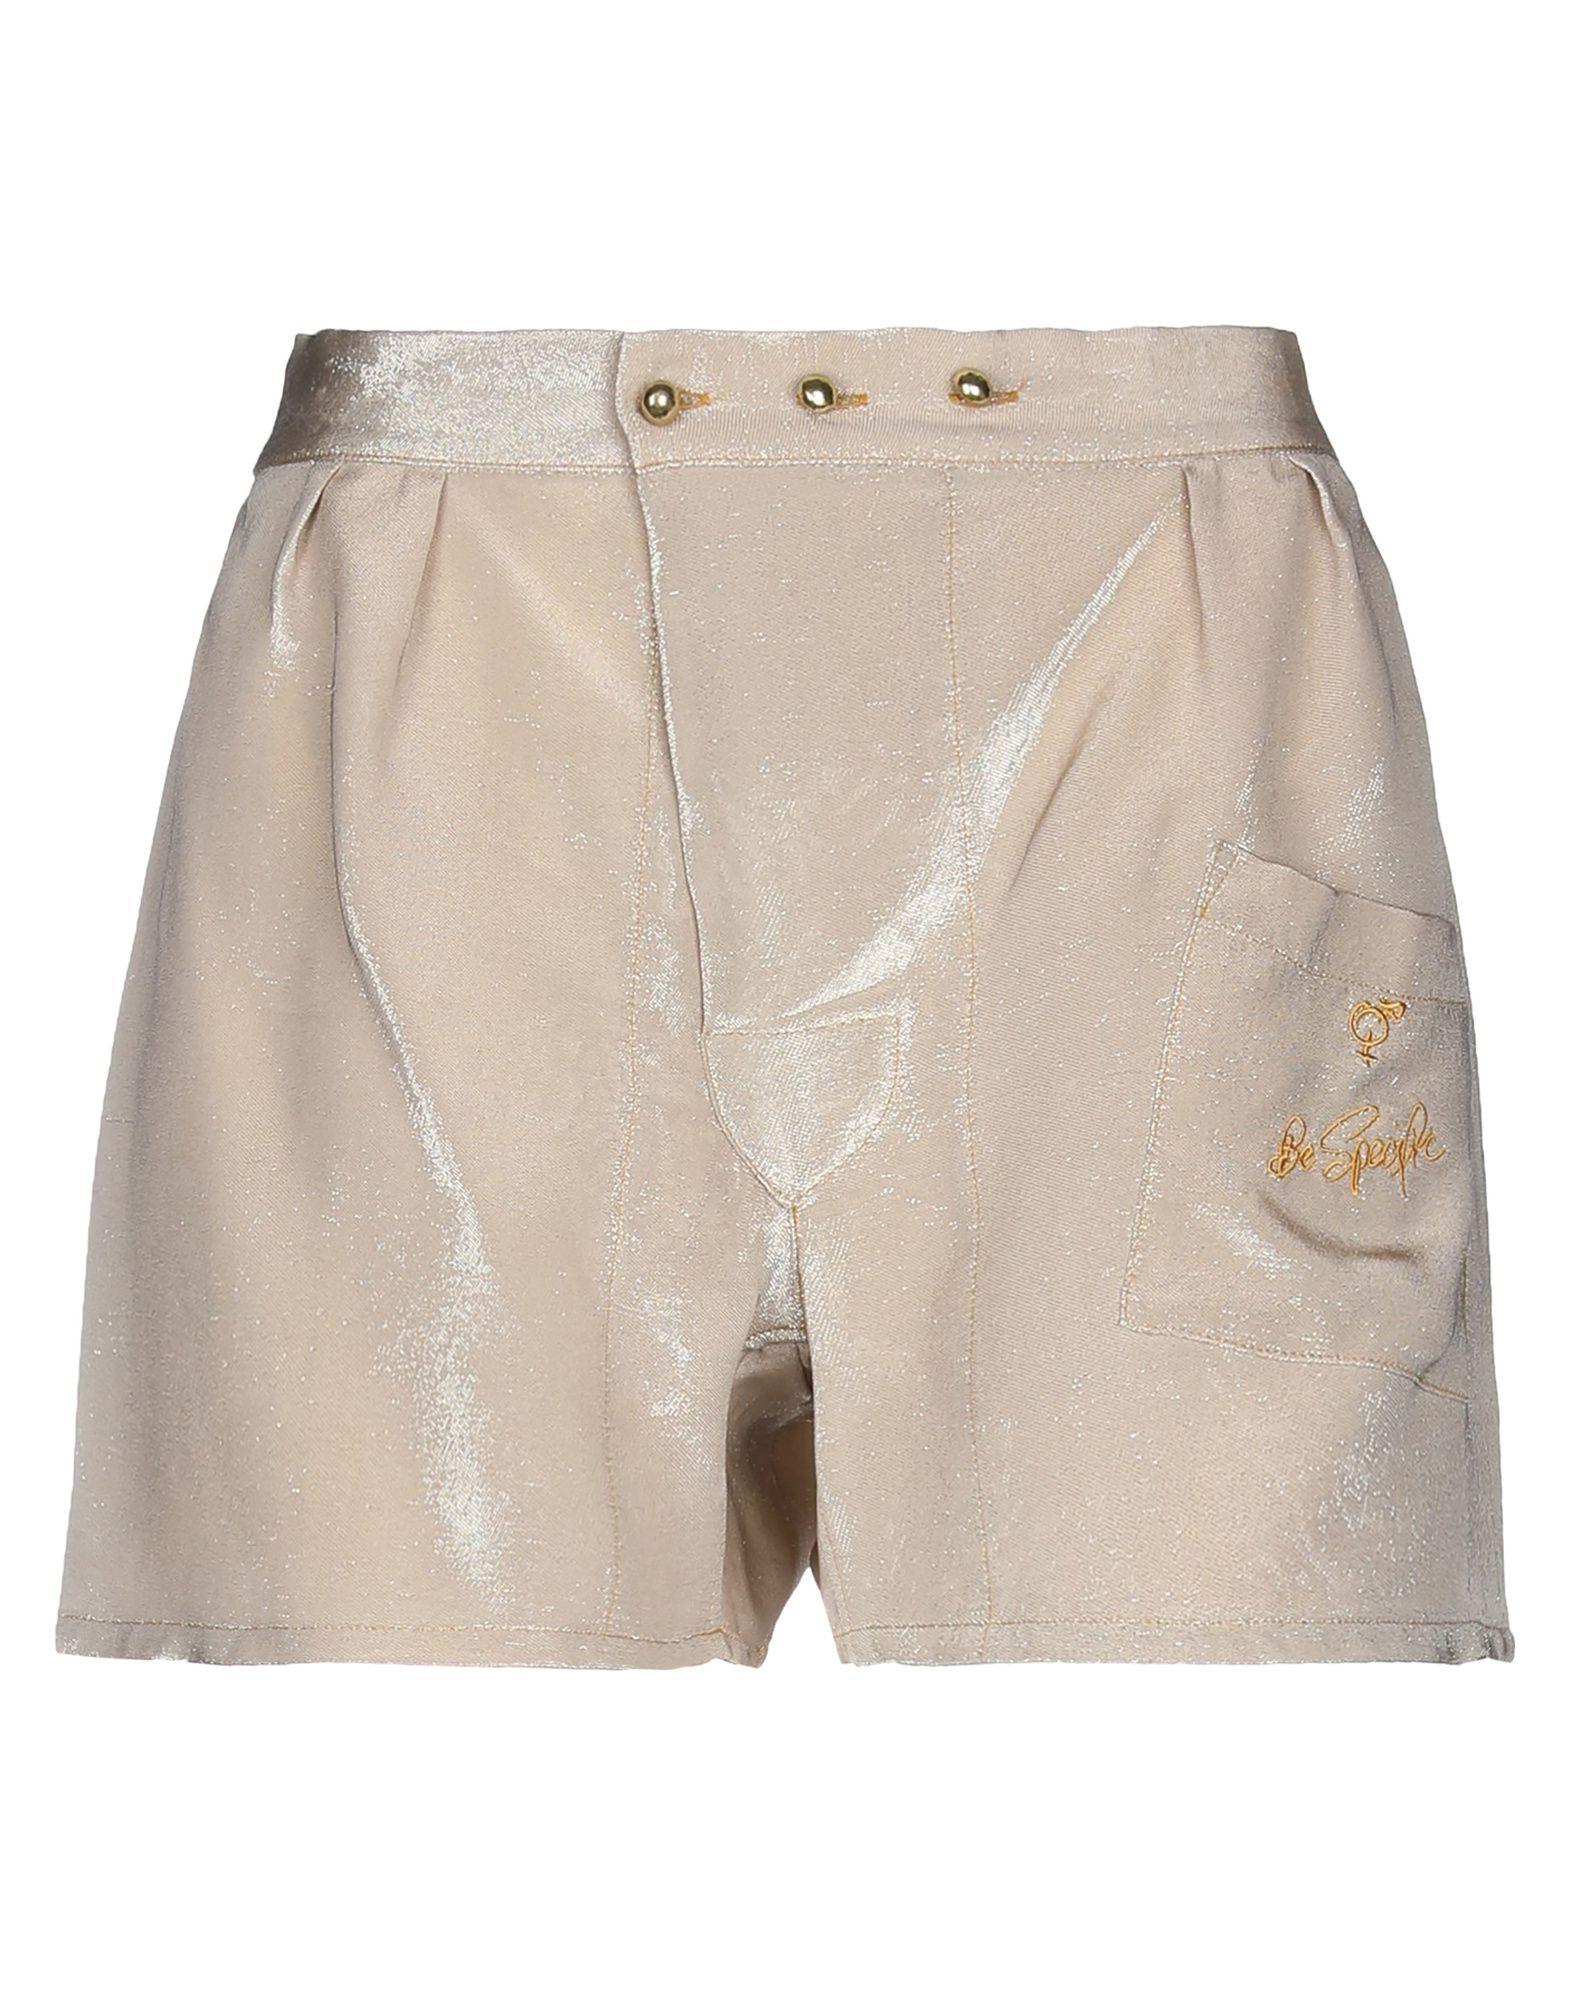 ANDREAS KRONTHALER for VIVIENNE WESTWOOD Повседневные шорты недорго, оригинальная цена